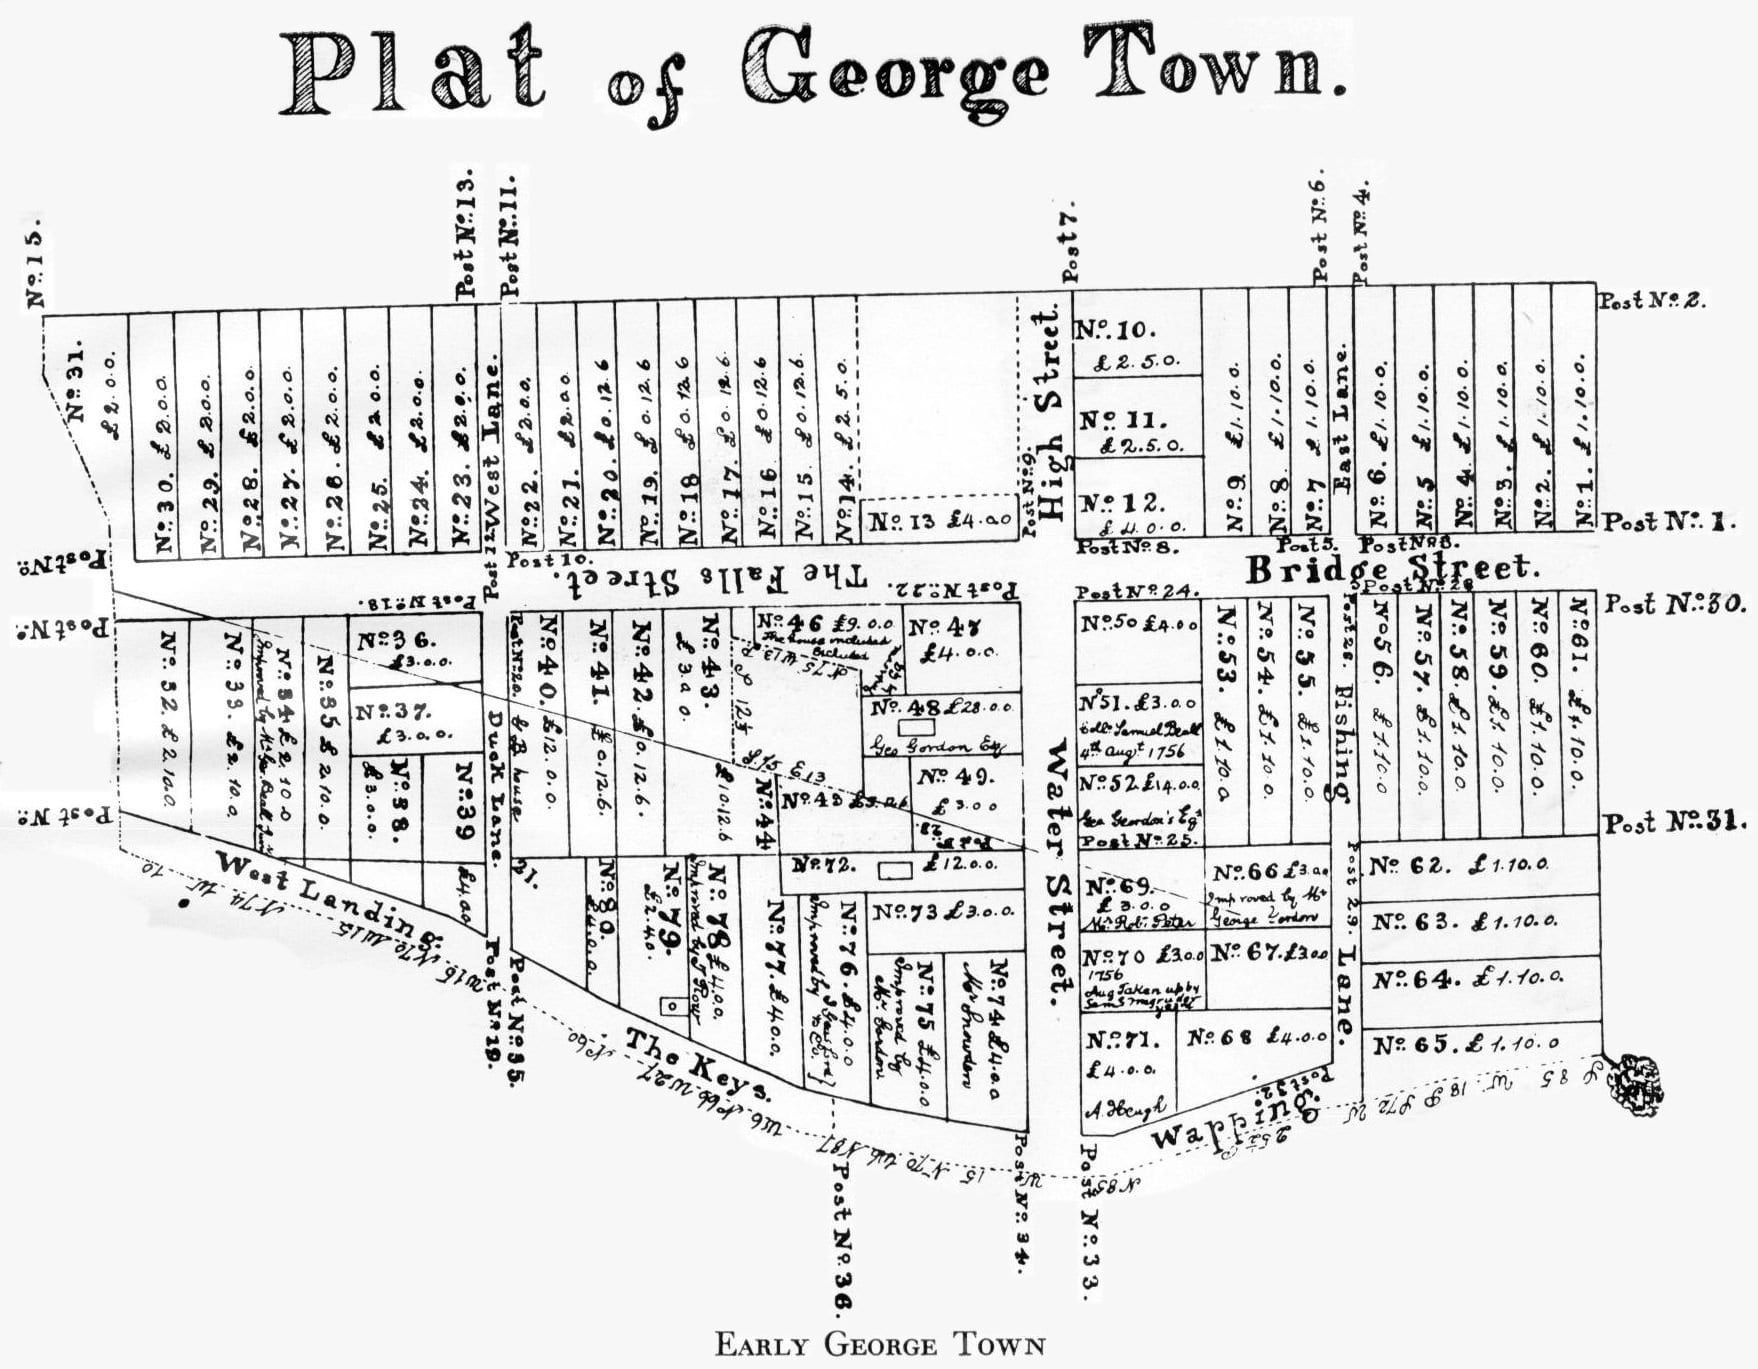 Old plat of Georgetown (gutenberg.org)